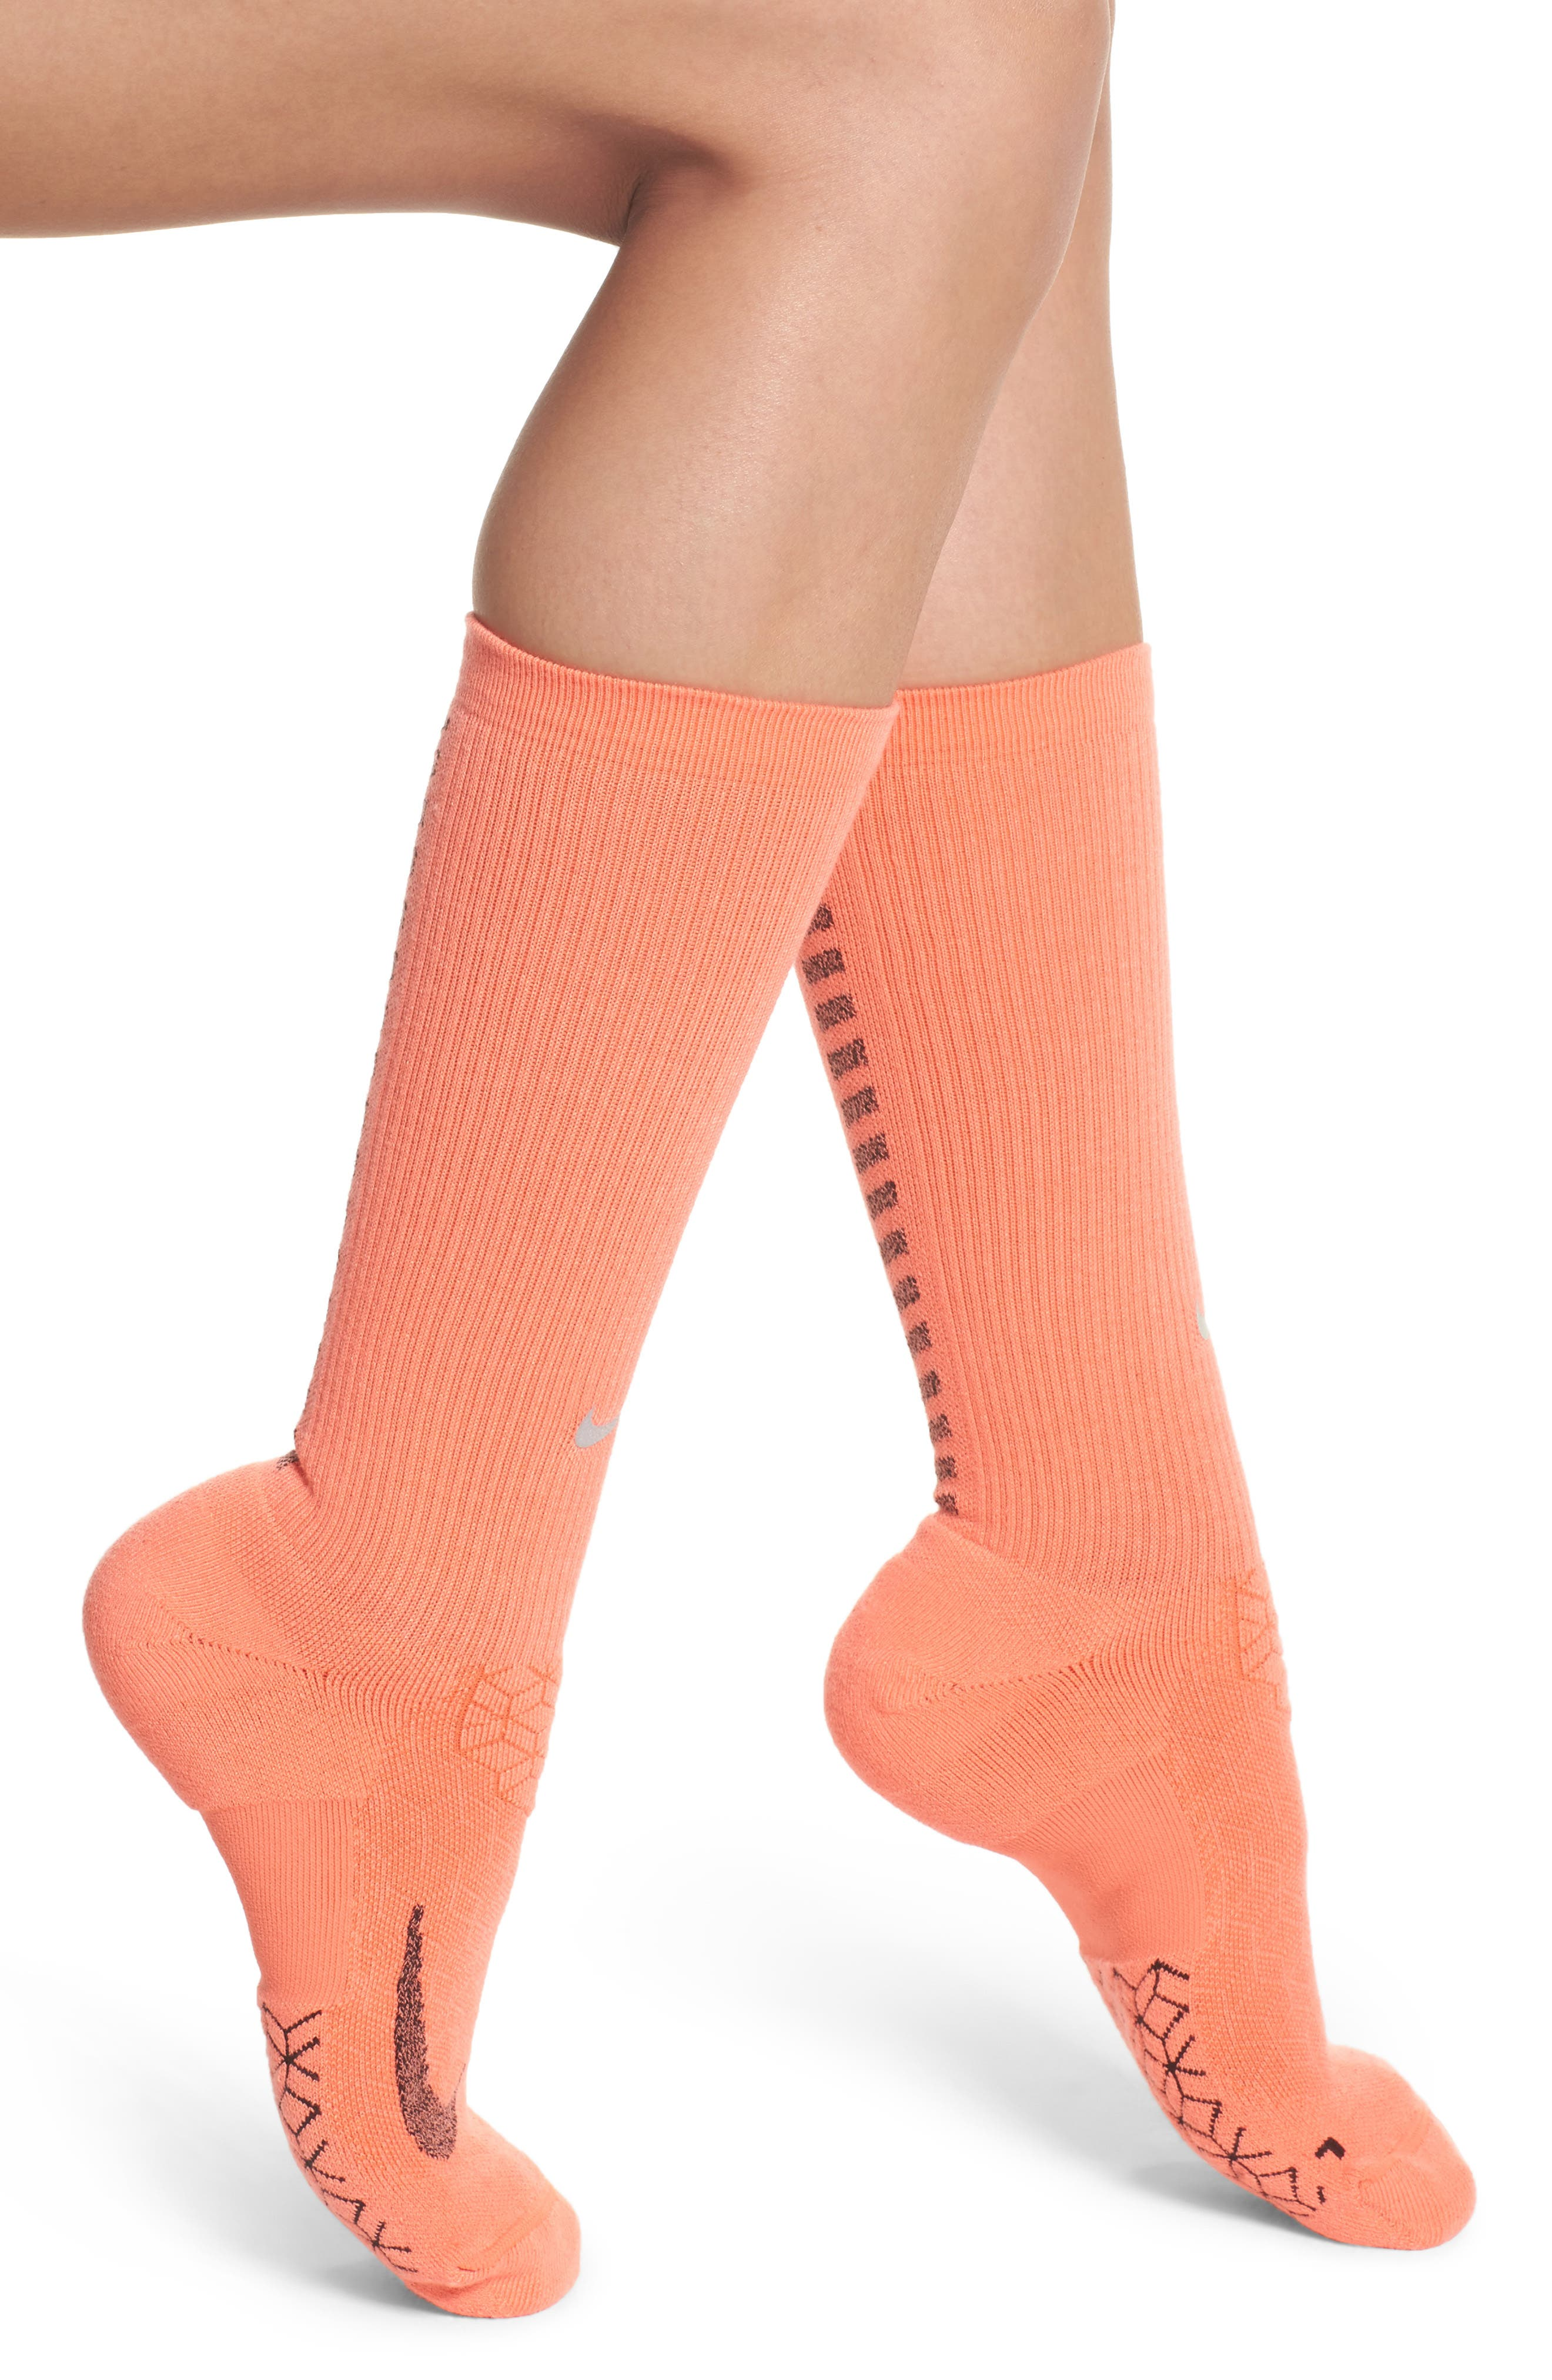 Elite Cushioned Running Crew Socks,                             Main thumbnail 1, color,                             Light Wild Mango/ Black